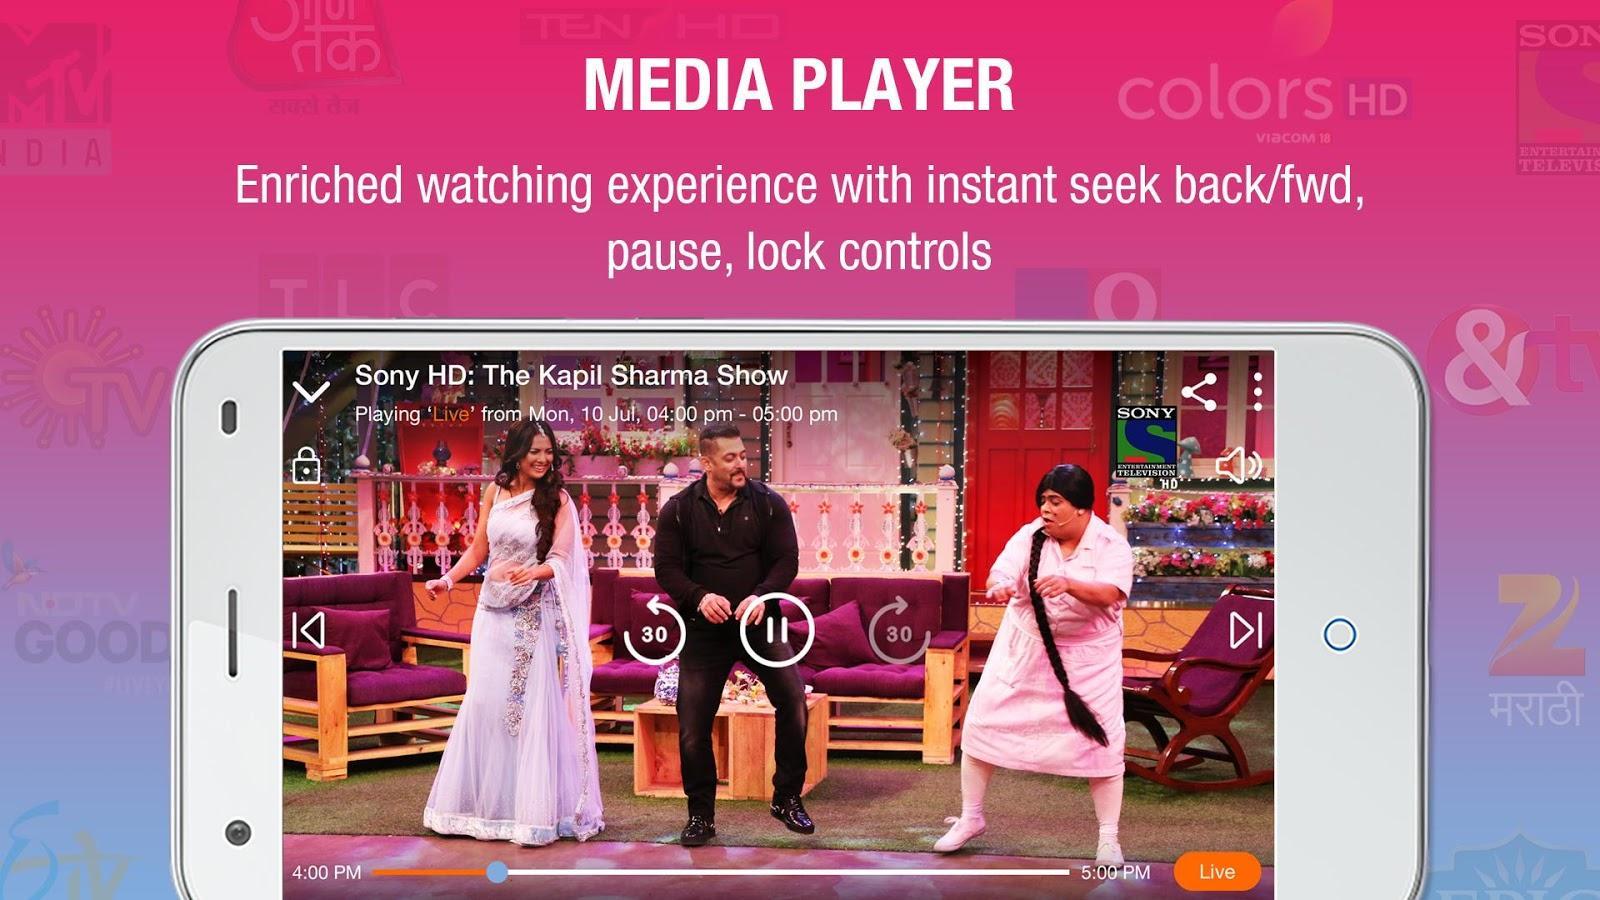 jiotv live sports movies shows